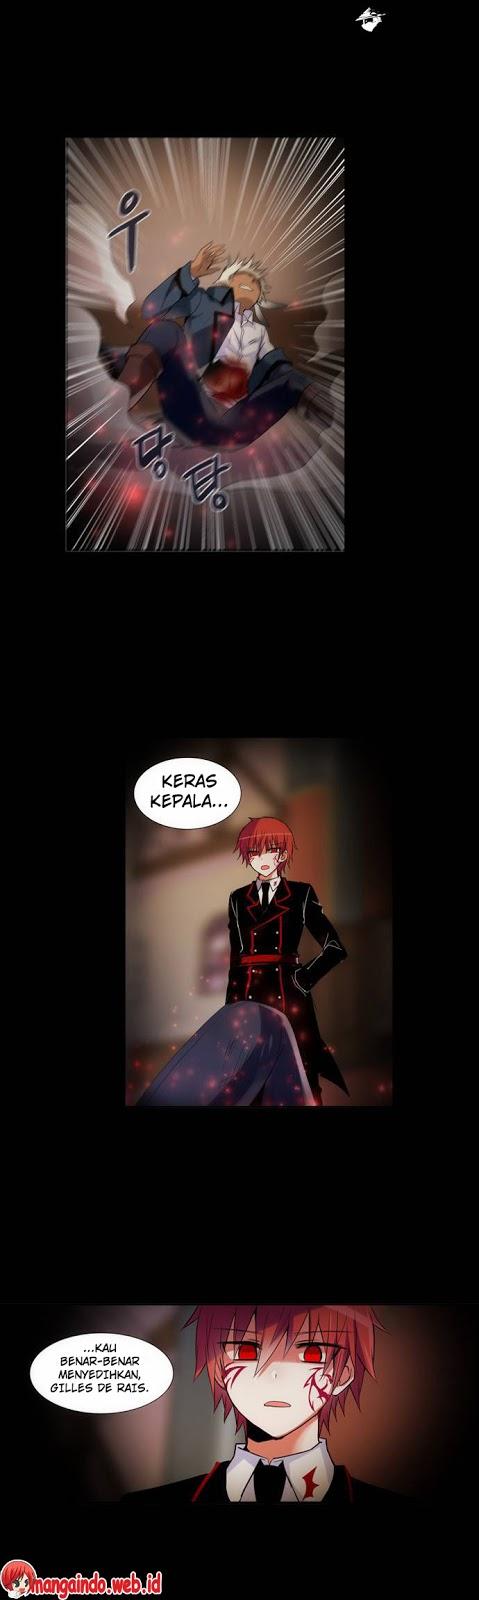 Komik crepuscule 151 - chapter 151 152 Indonesia crepuscule 151 - chapter 151 Terbaru 18|Baca Manga Komik Indonesia